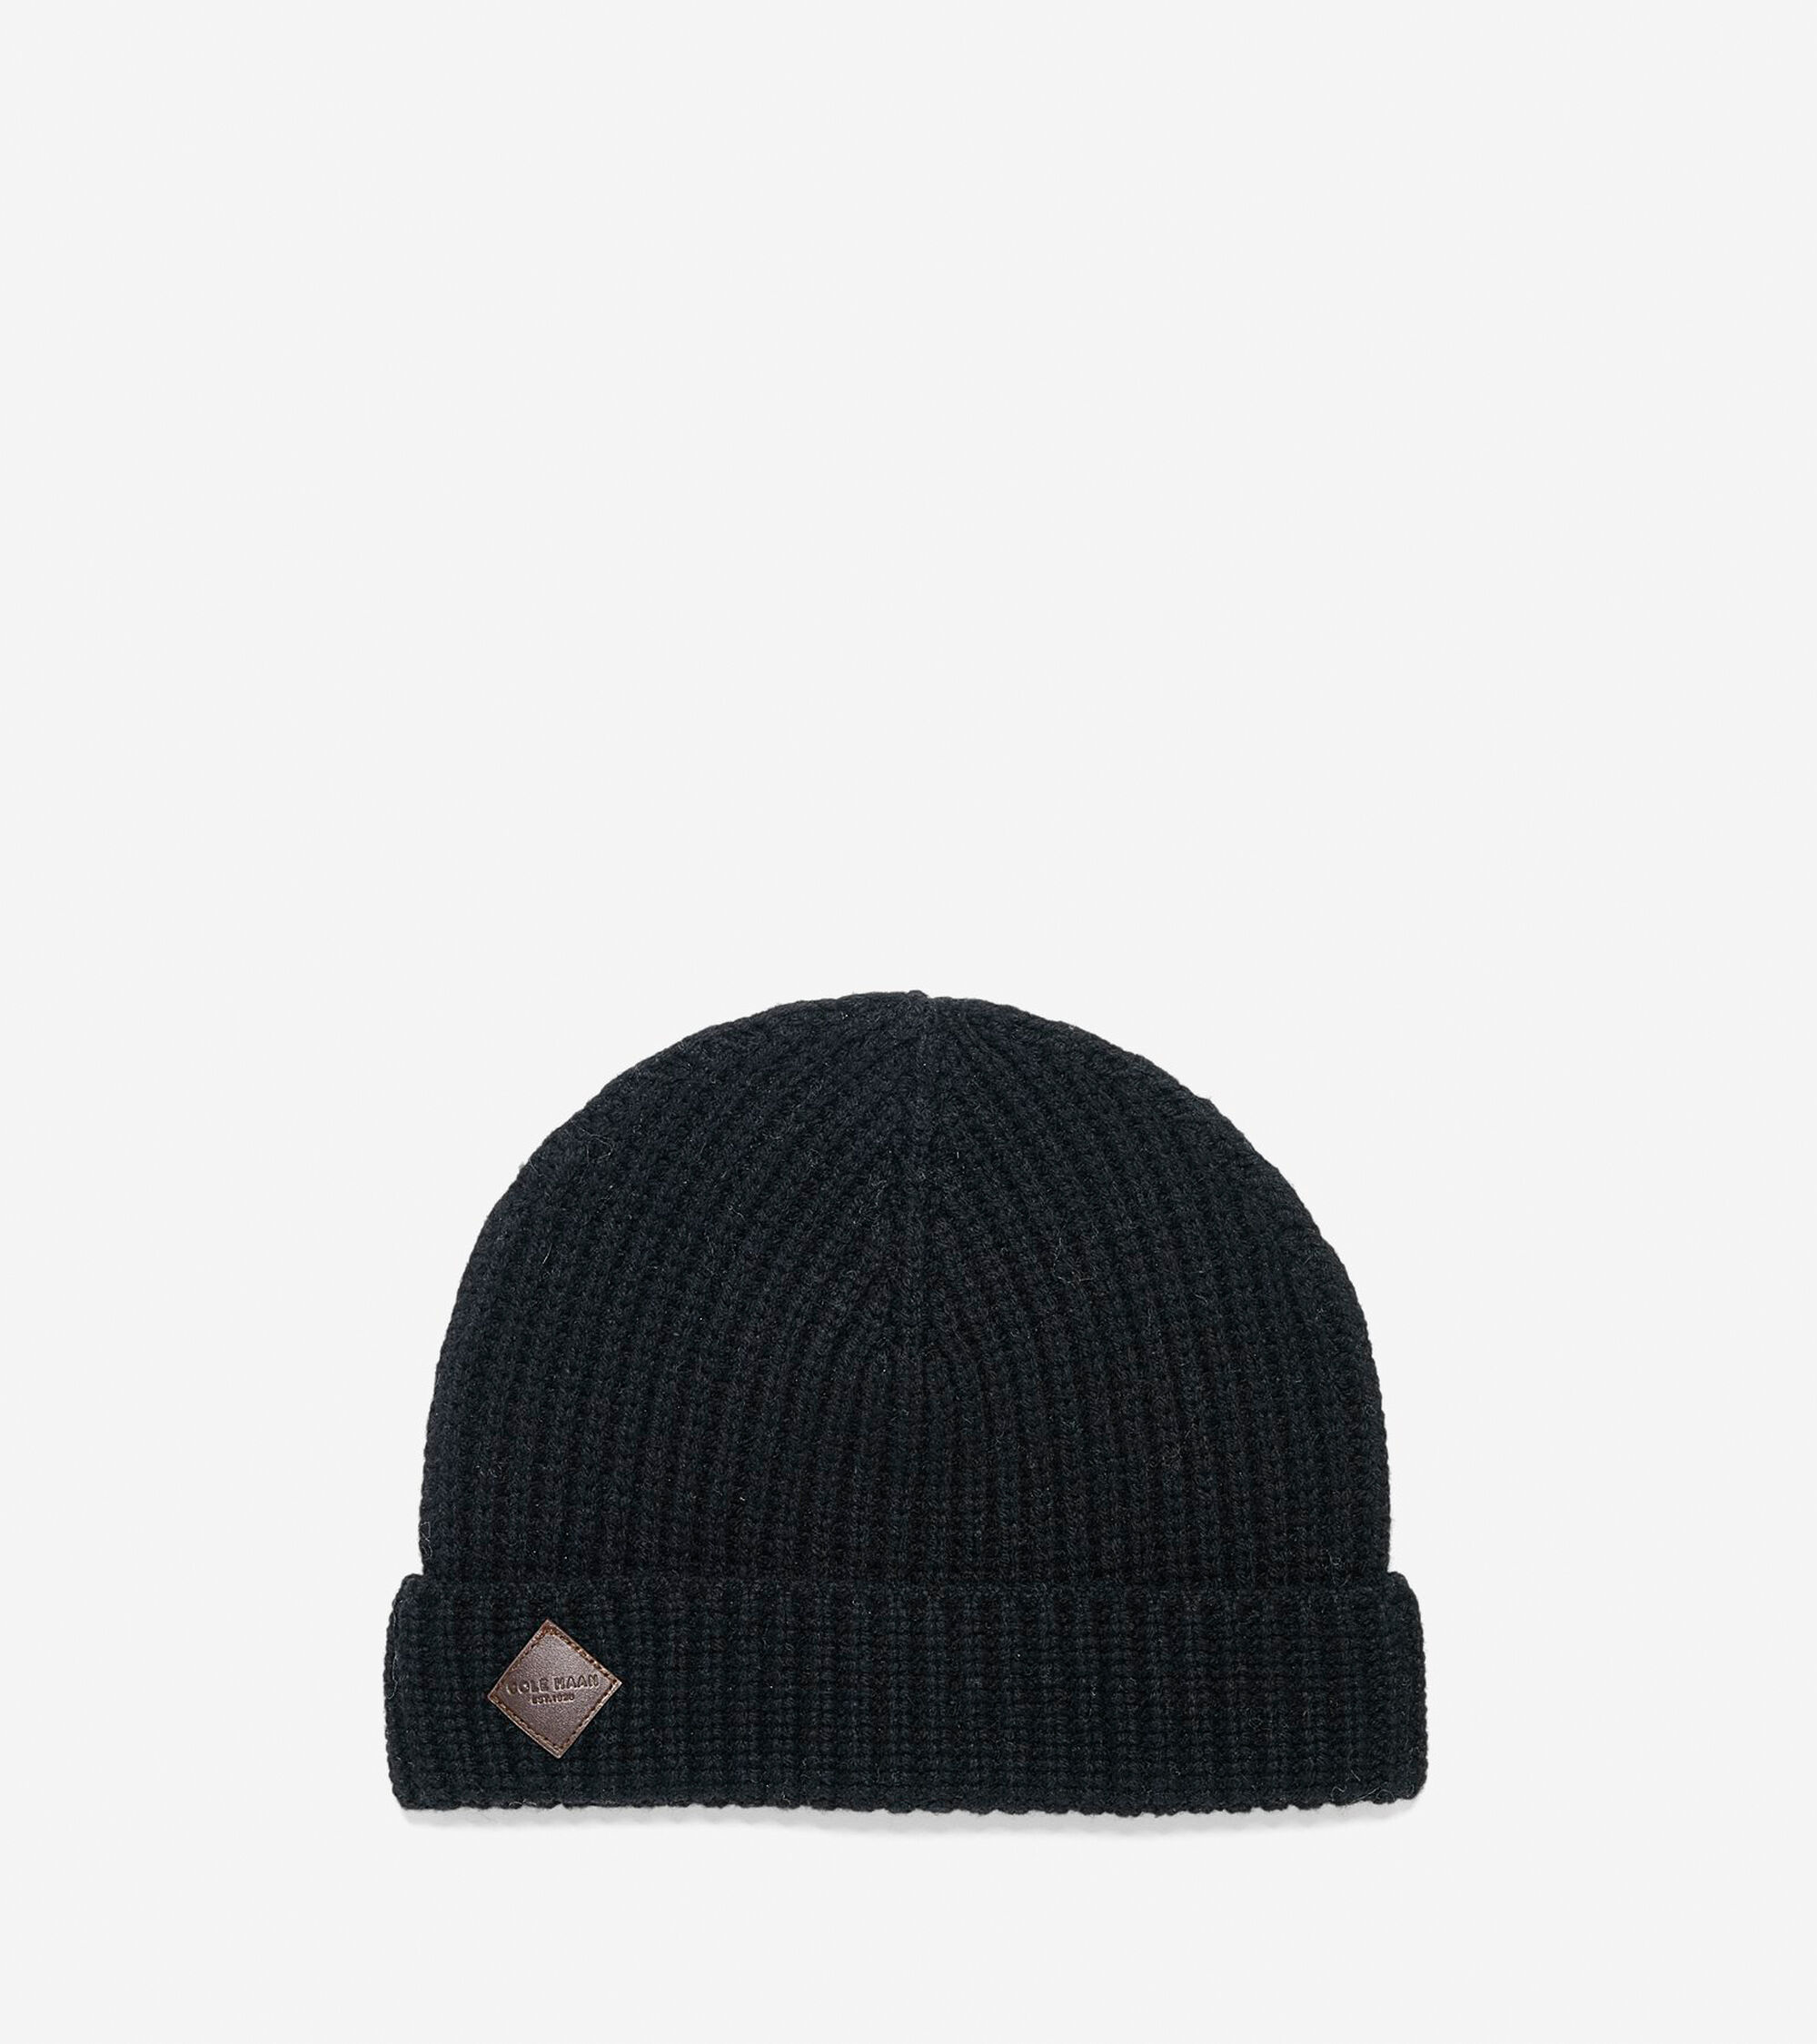 Accessories > Half Cardigan Stitch Hat